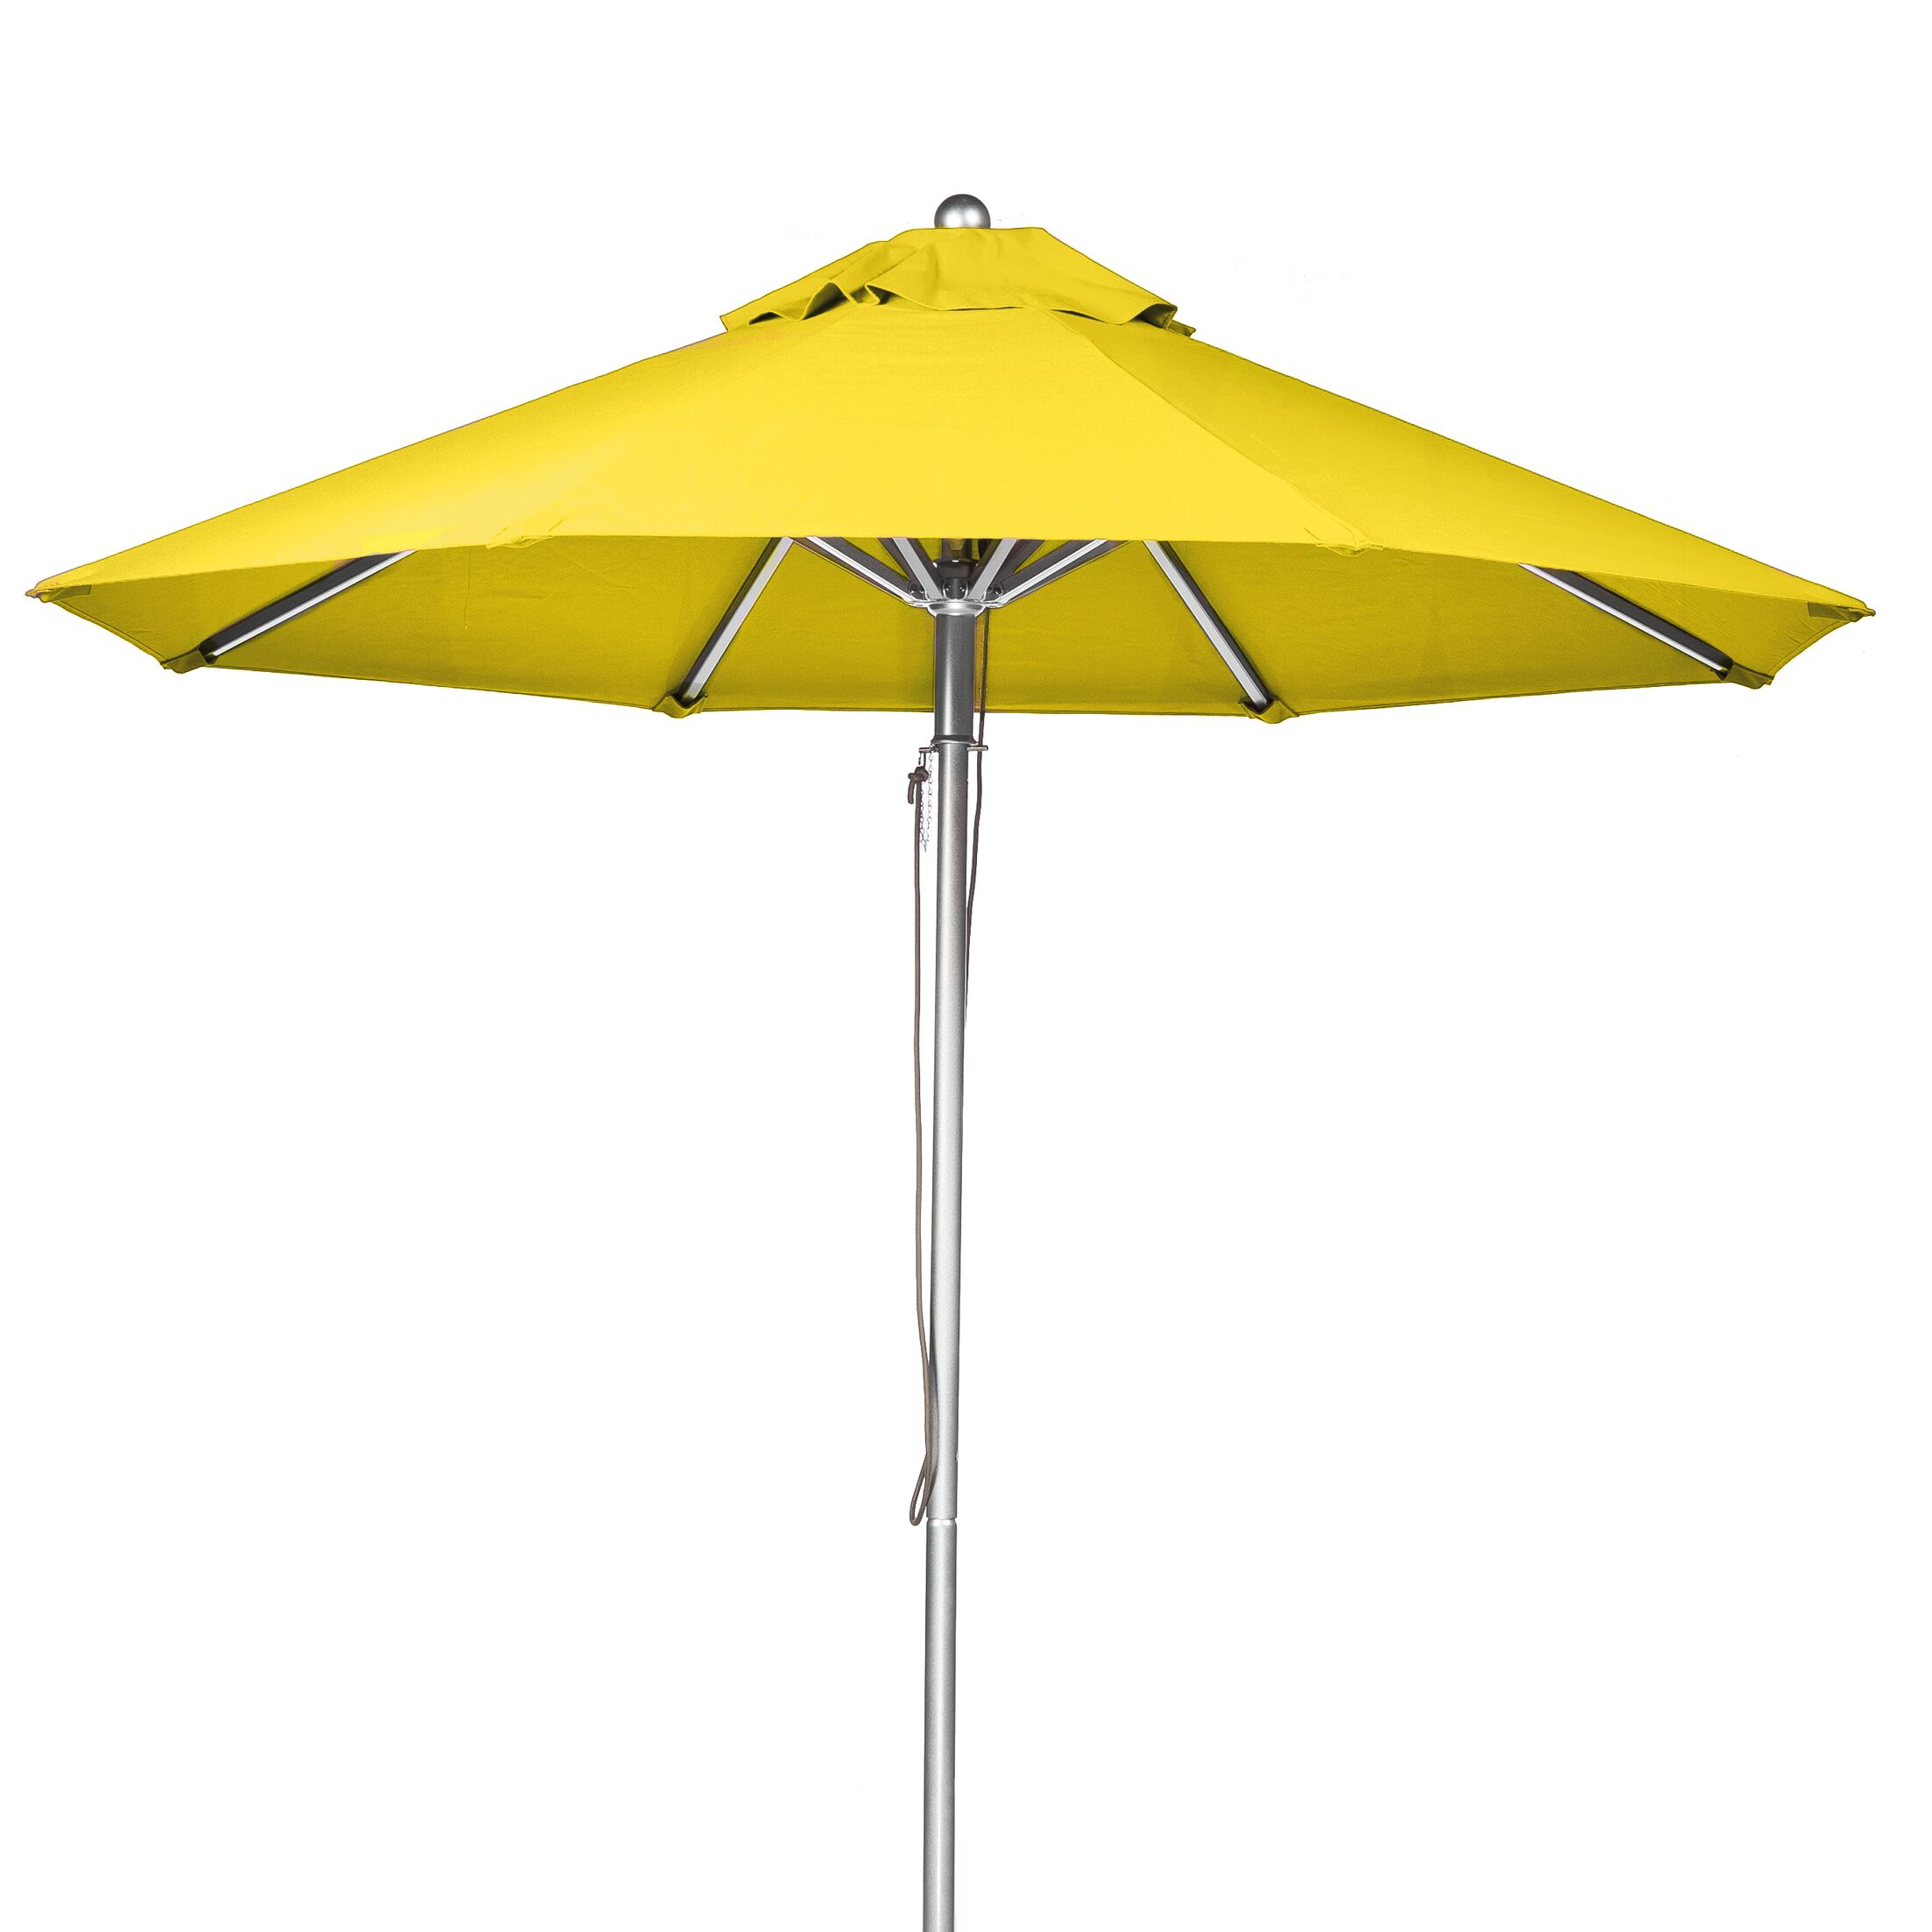 7.5' Market Umbrella Fabric: Yellow